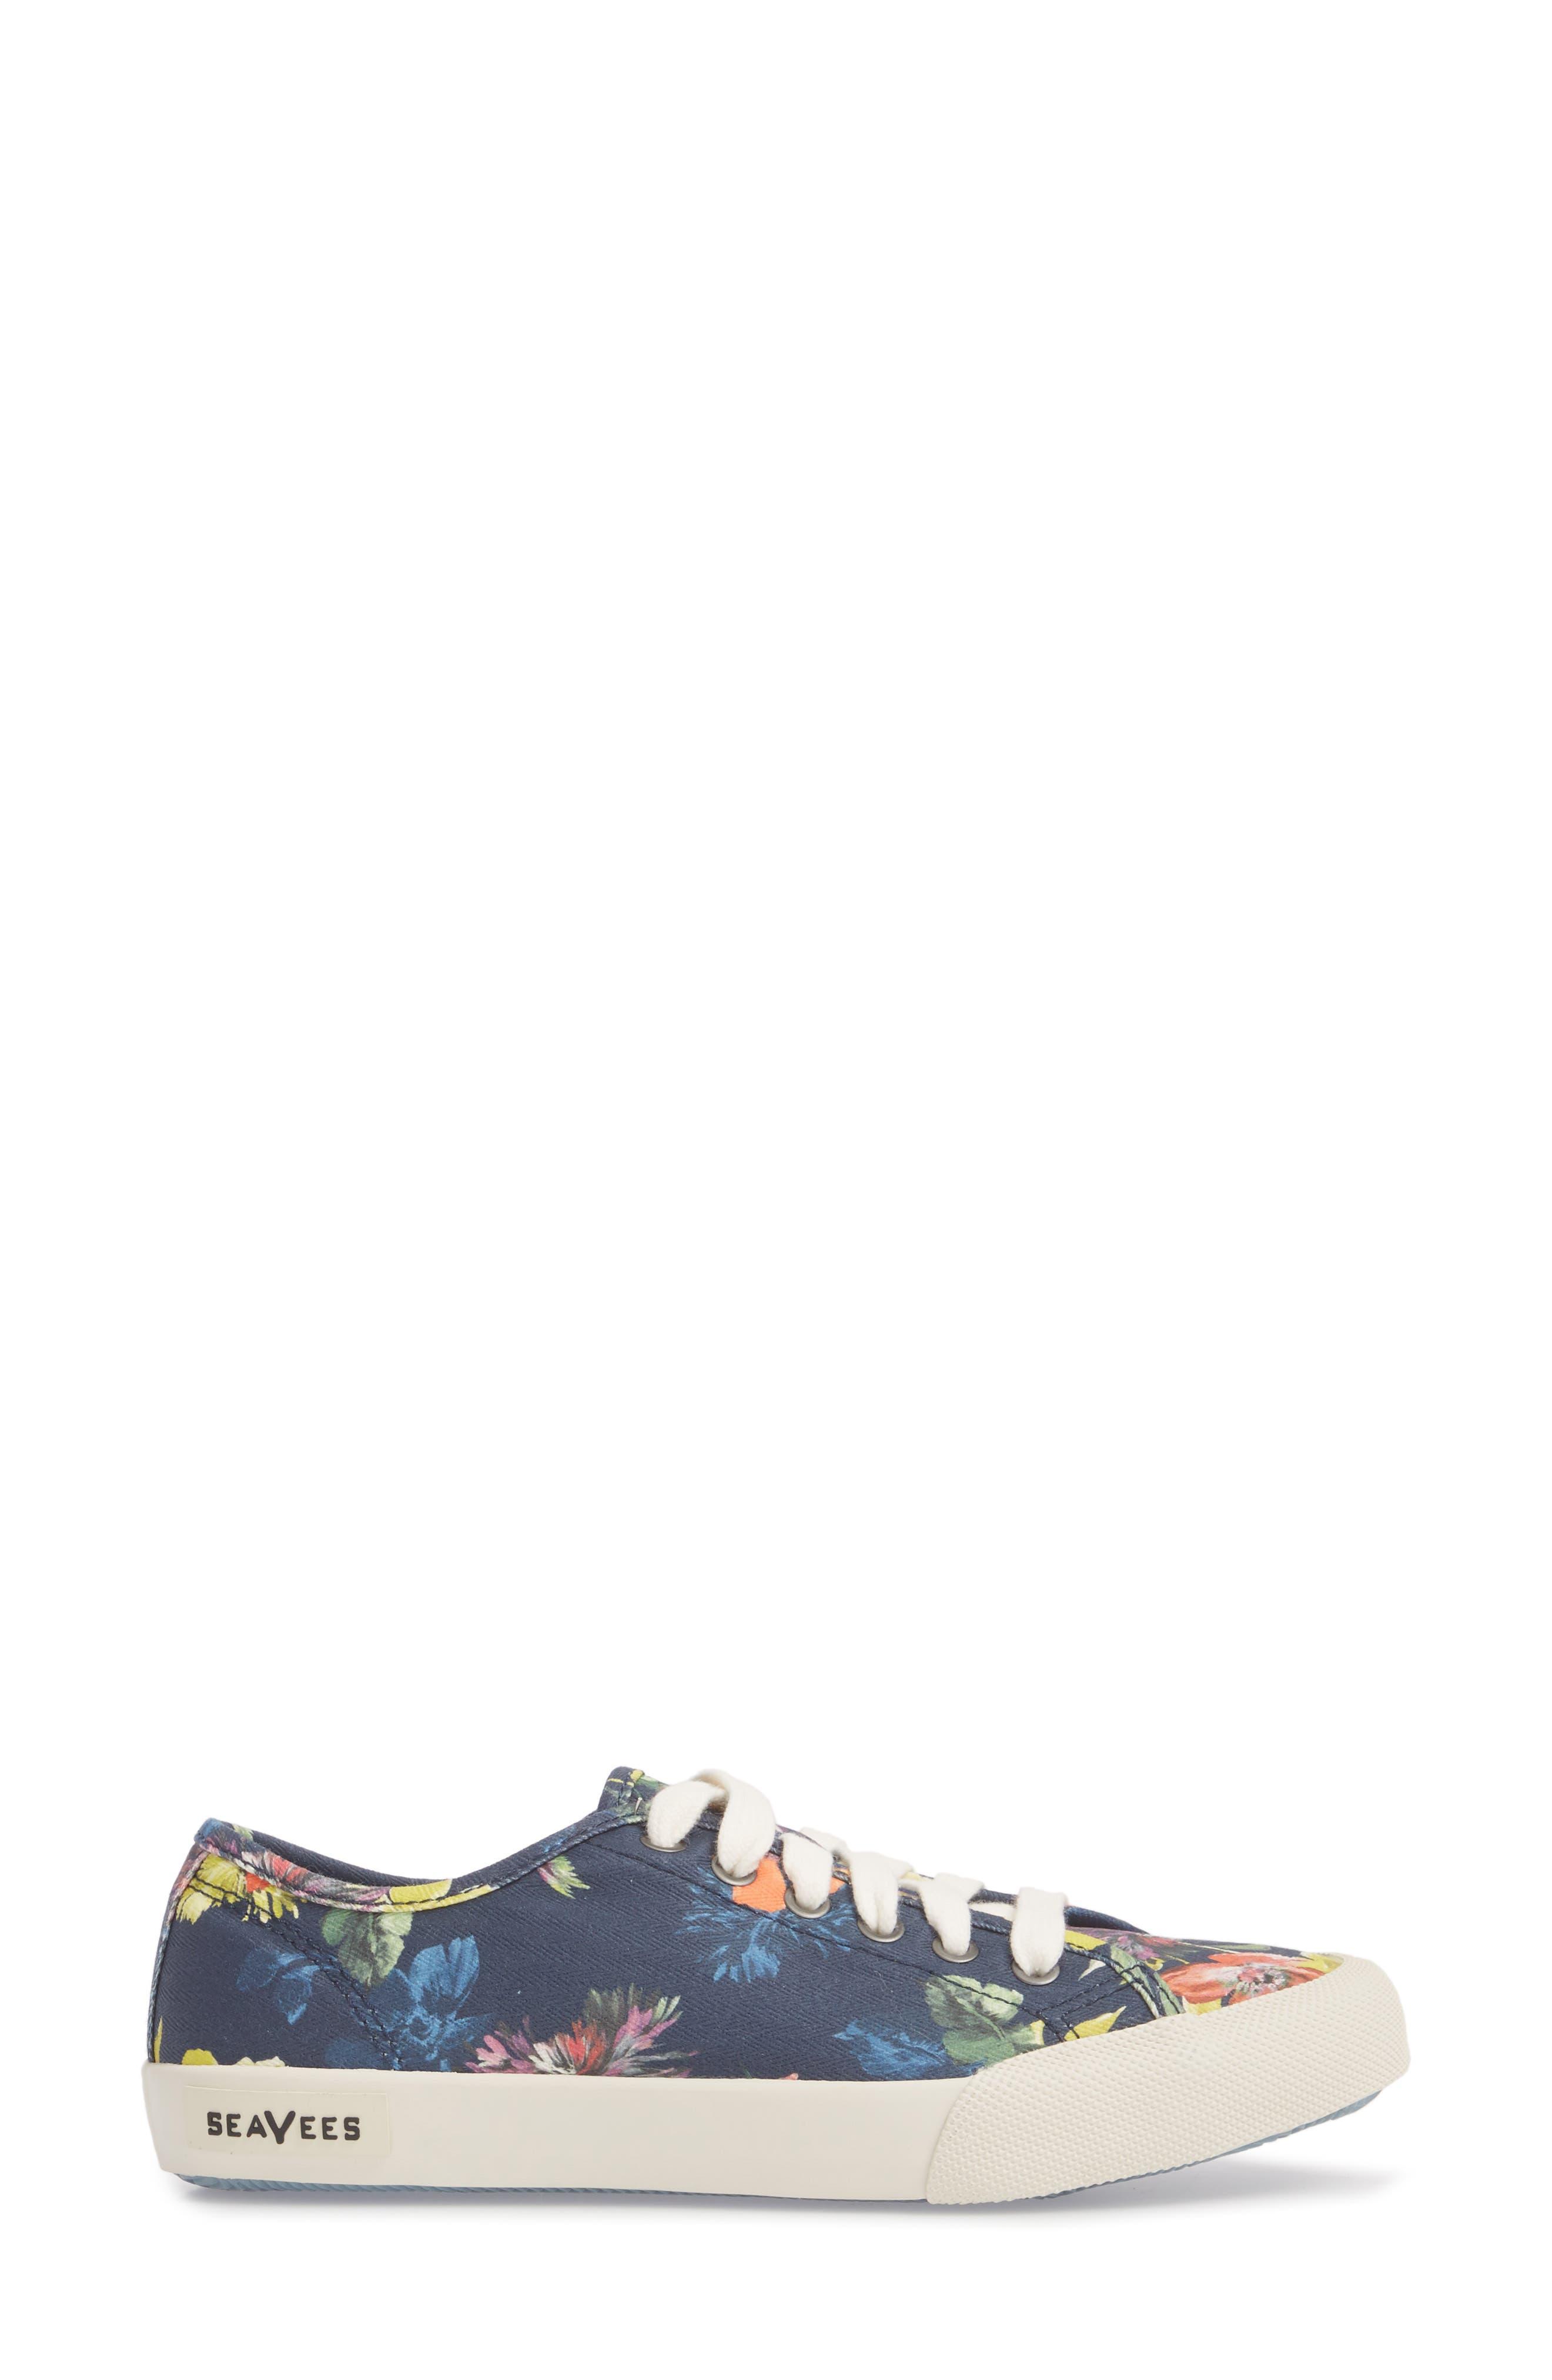 x Trina Turk Monterey Sneaker,                             Alternate thumbnail 3, color,                             NAVY CHRYSANTHEMUM